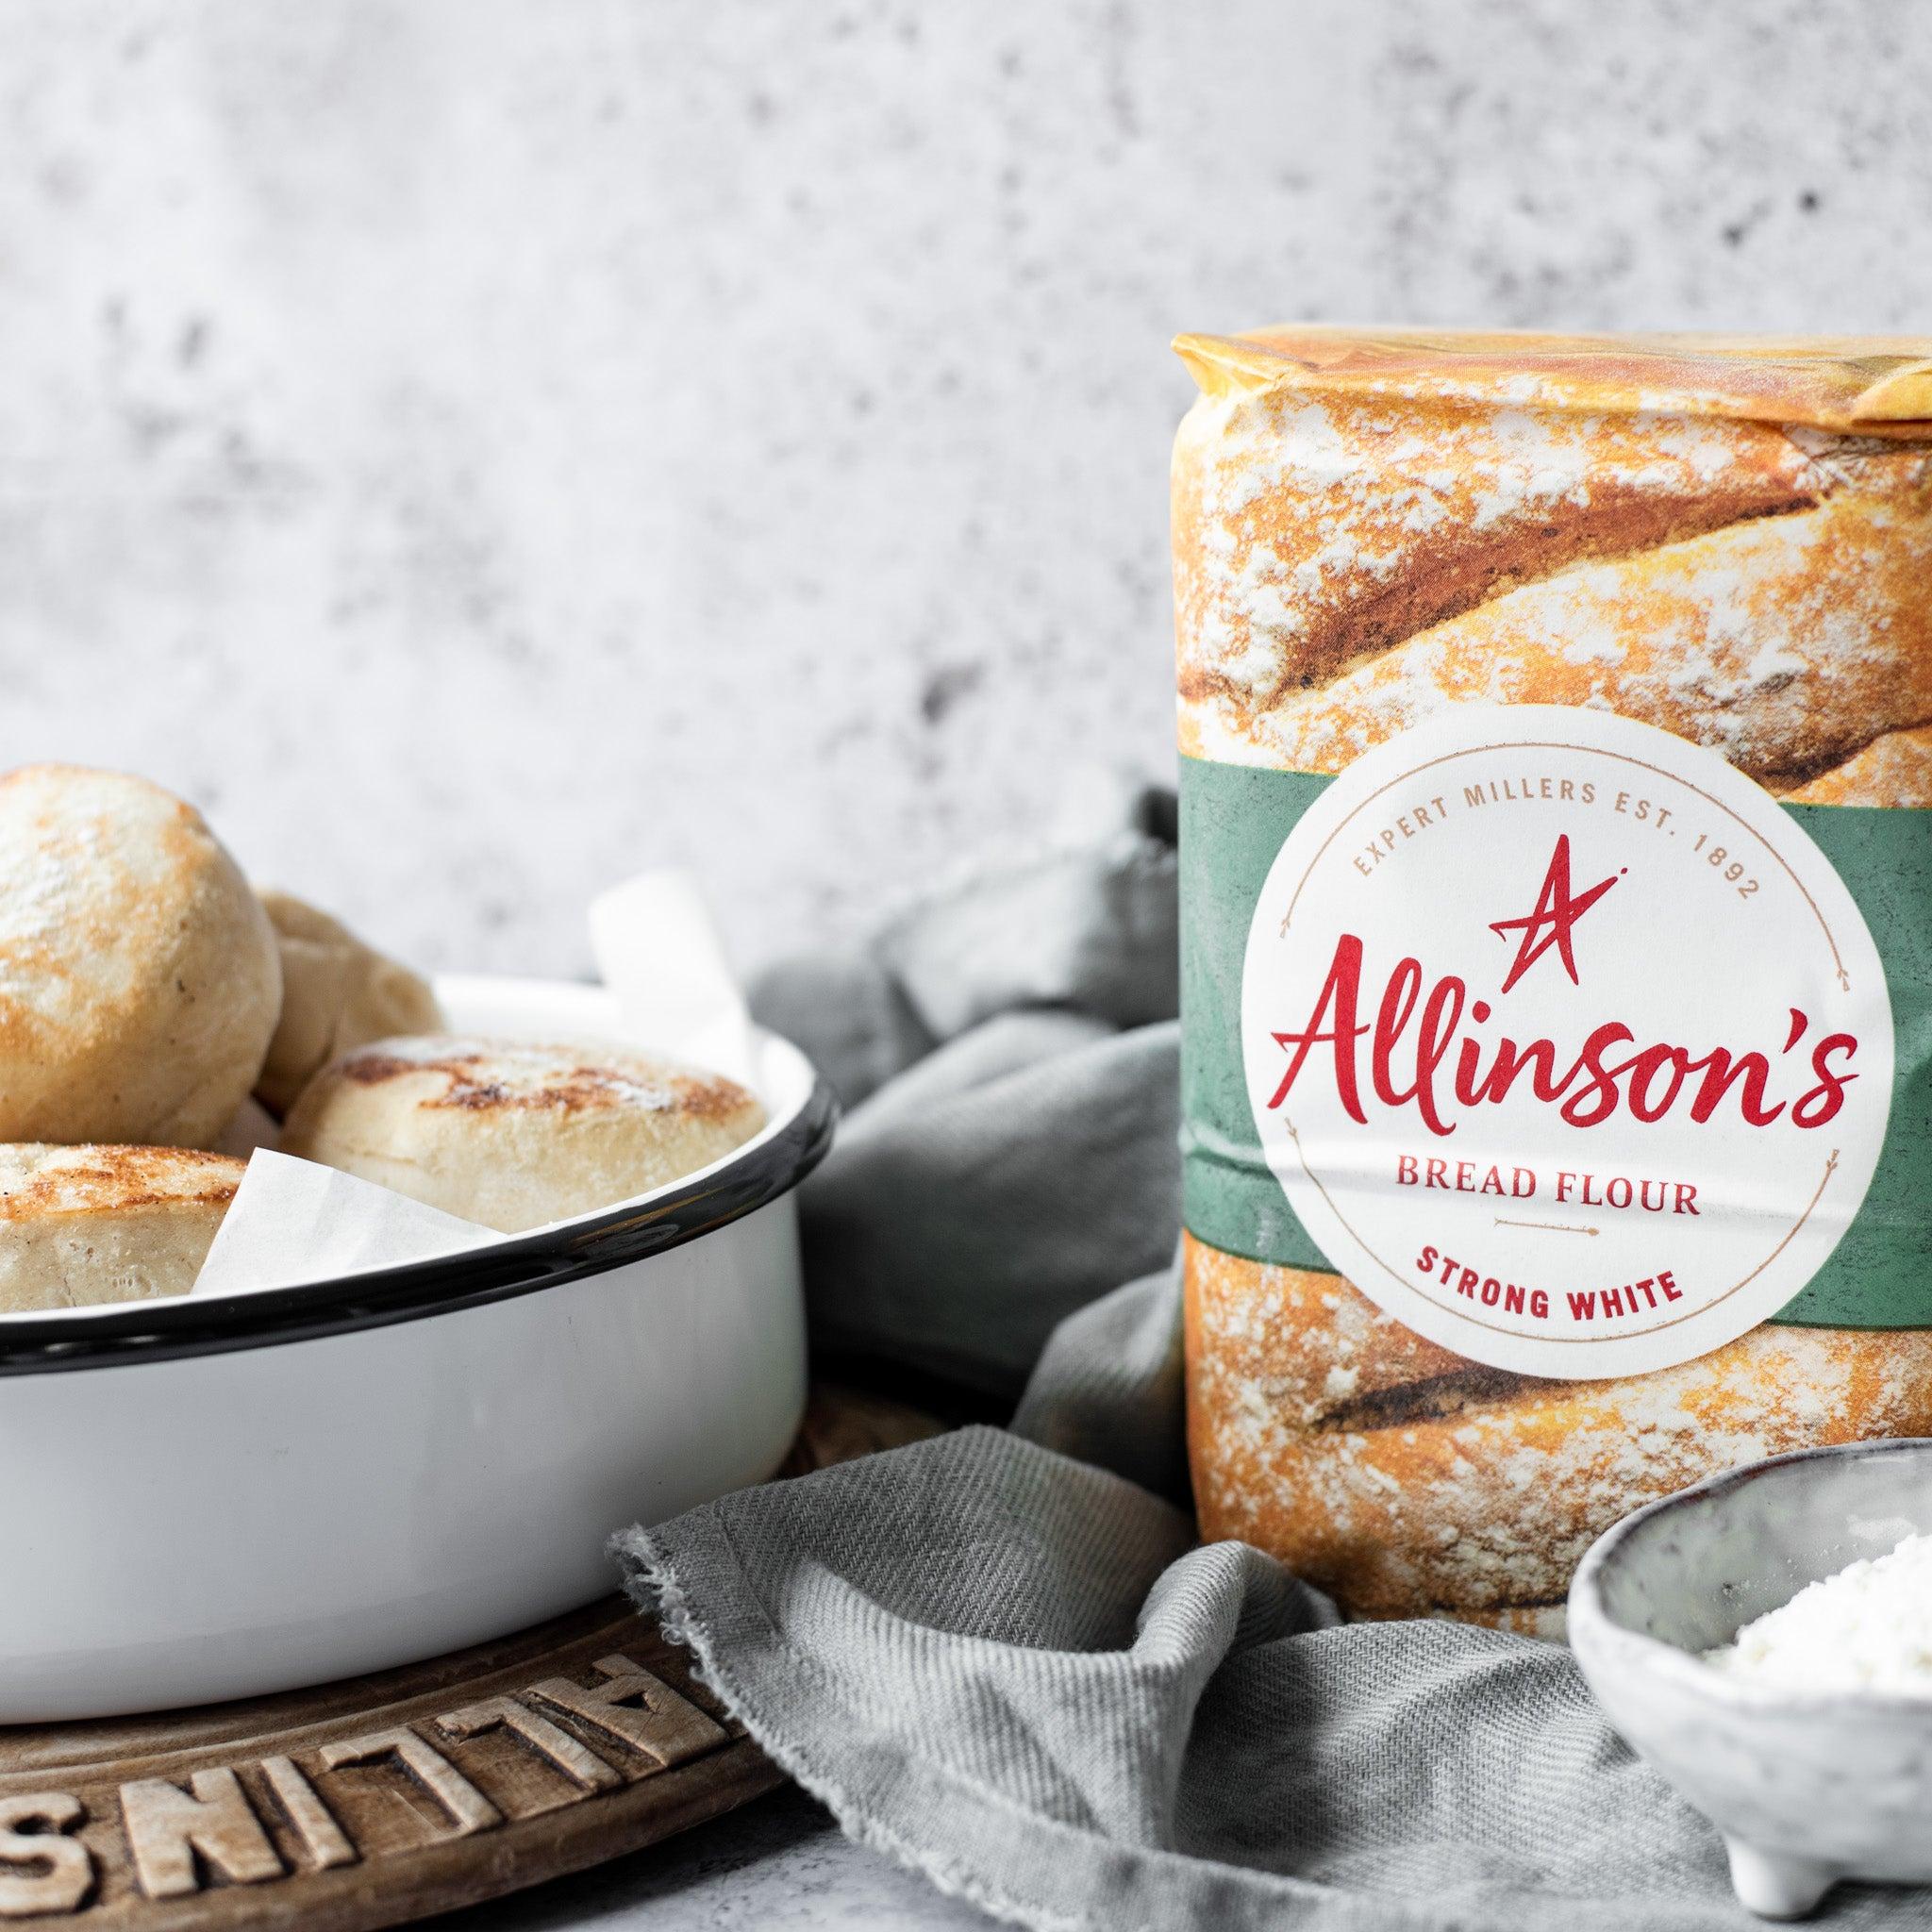 Allinsons-English-Muffins-1-1-Baking-Mad-1.jpg